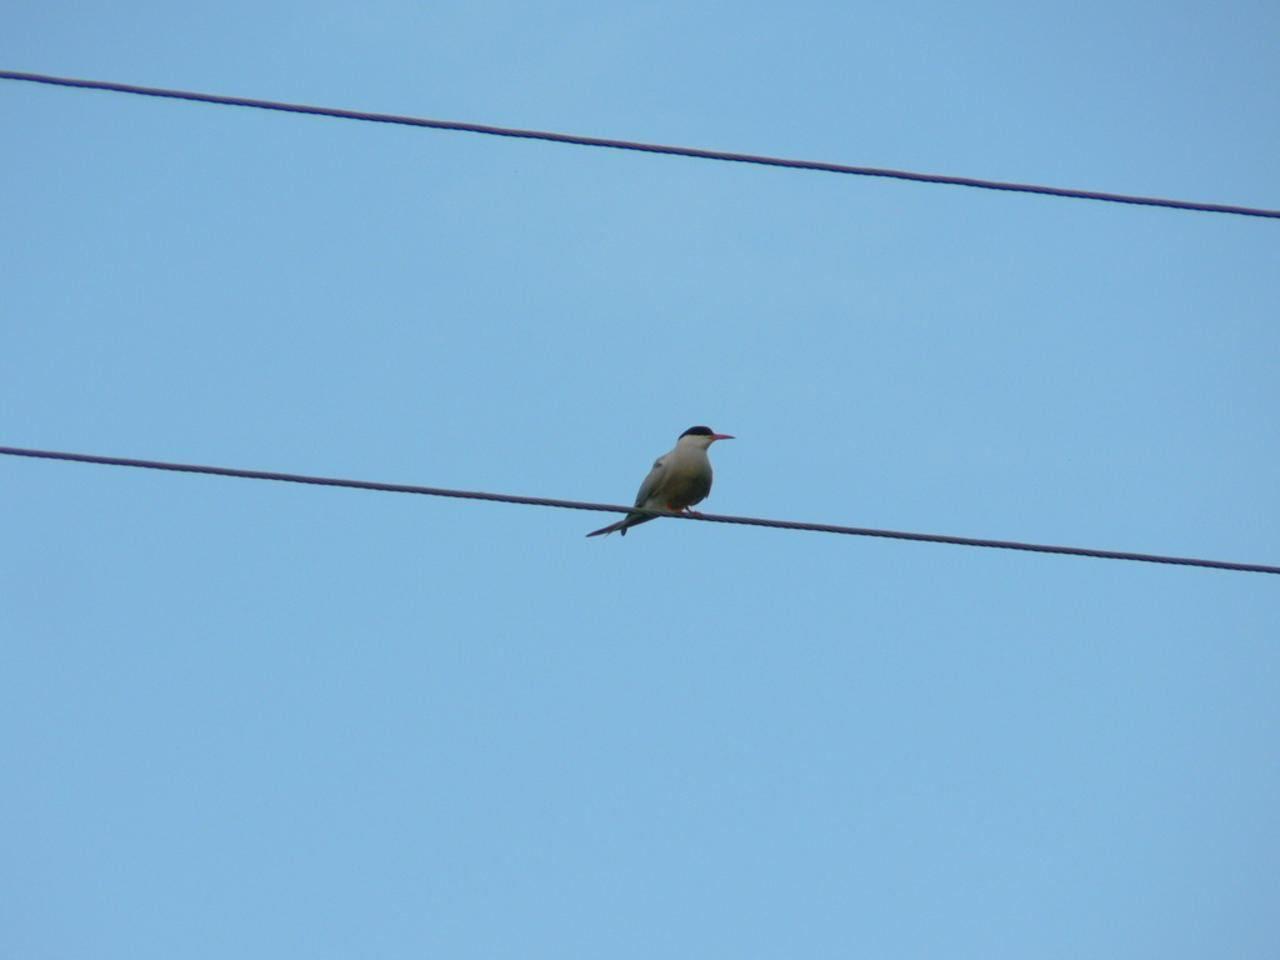 Free picture: bird, telephone, line